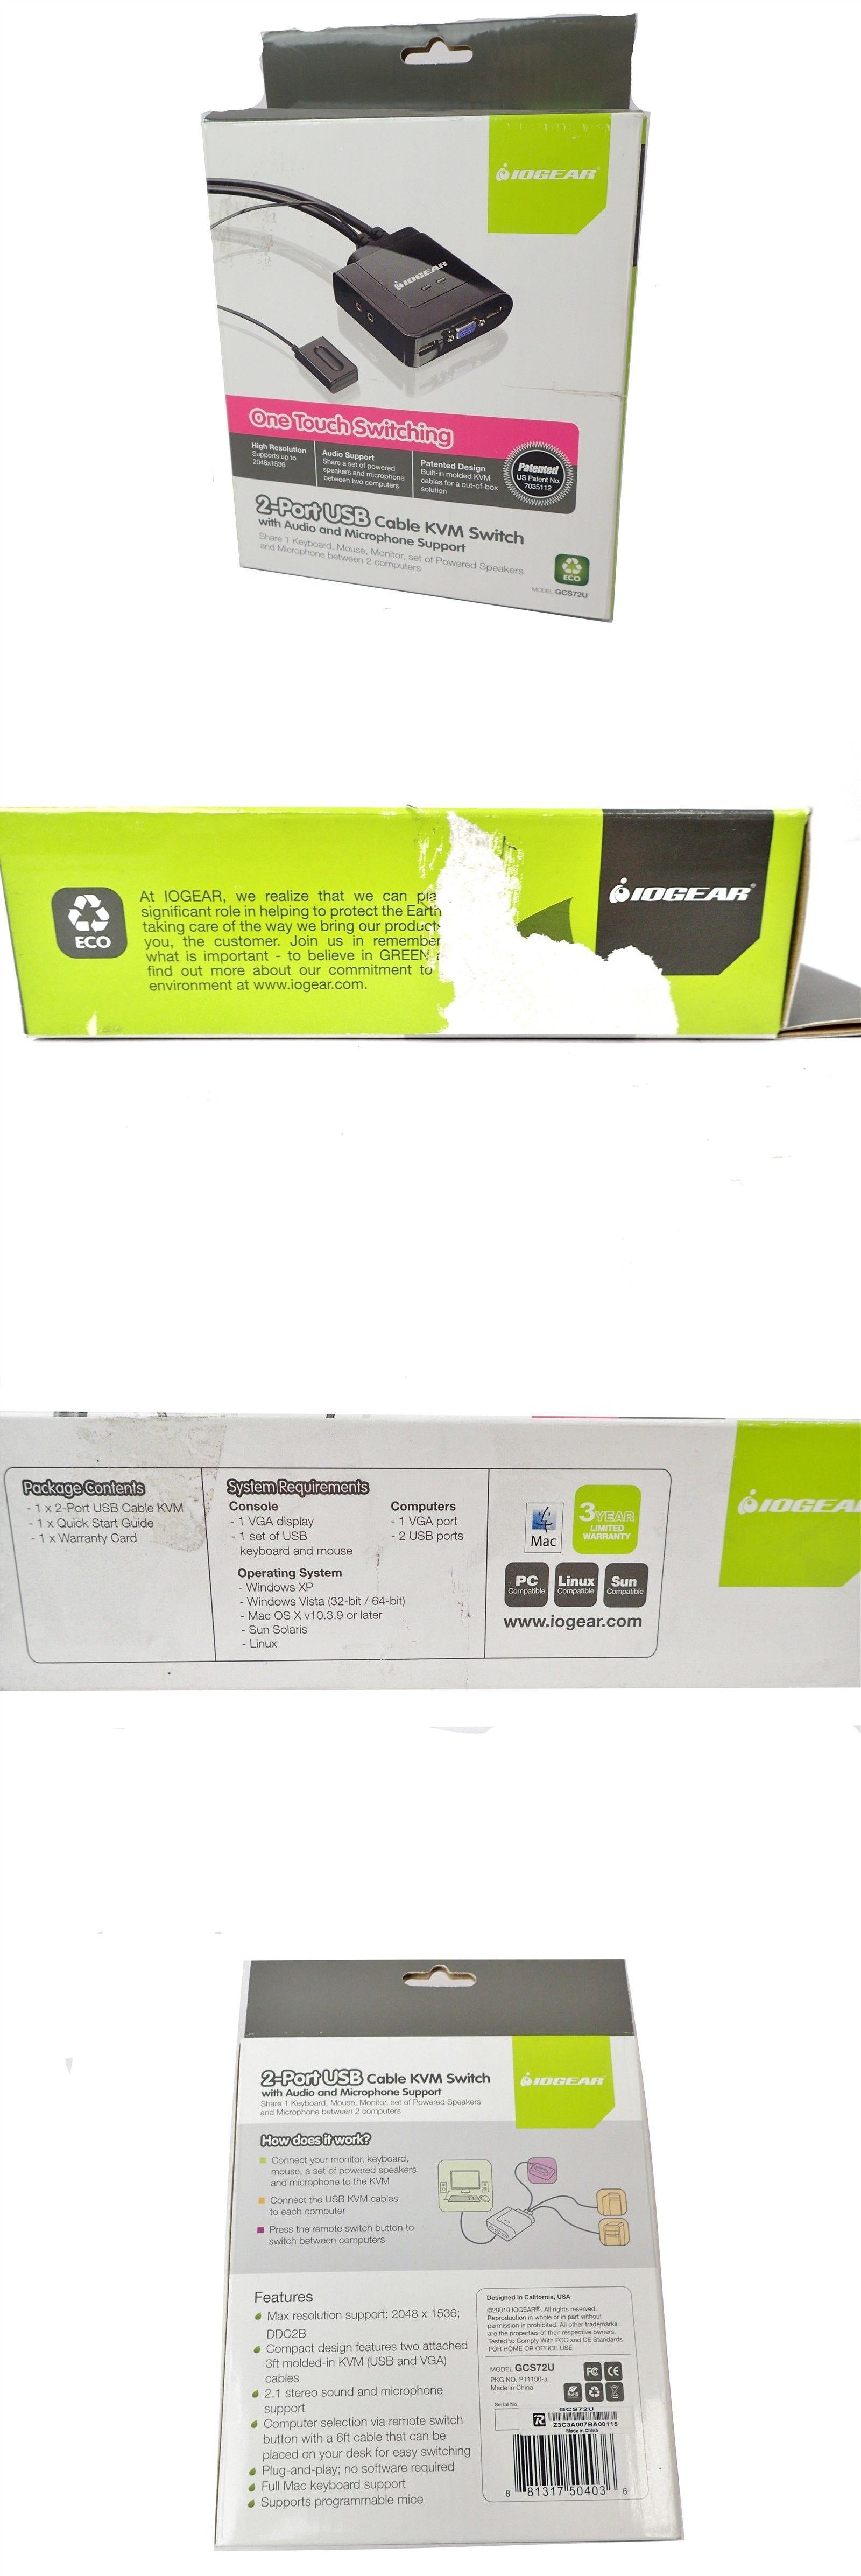 KVM Switches 182096: New Iogear 2 Port Usb Cable Kvm Switch